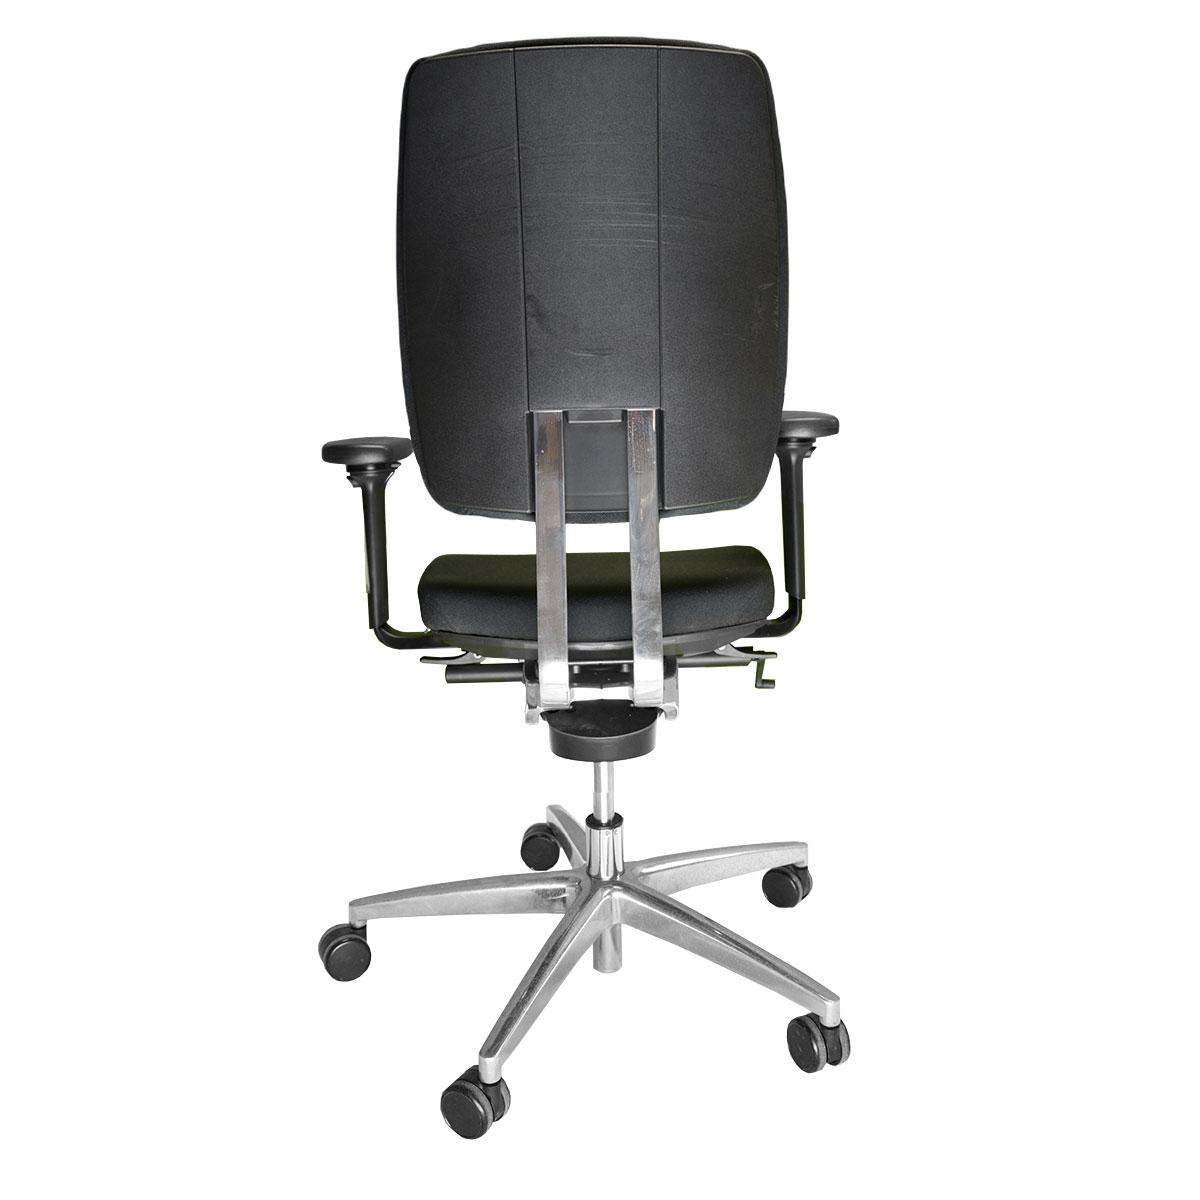 Ergocoach-Deluxe-NPR-bureaustoel